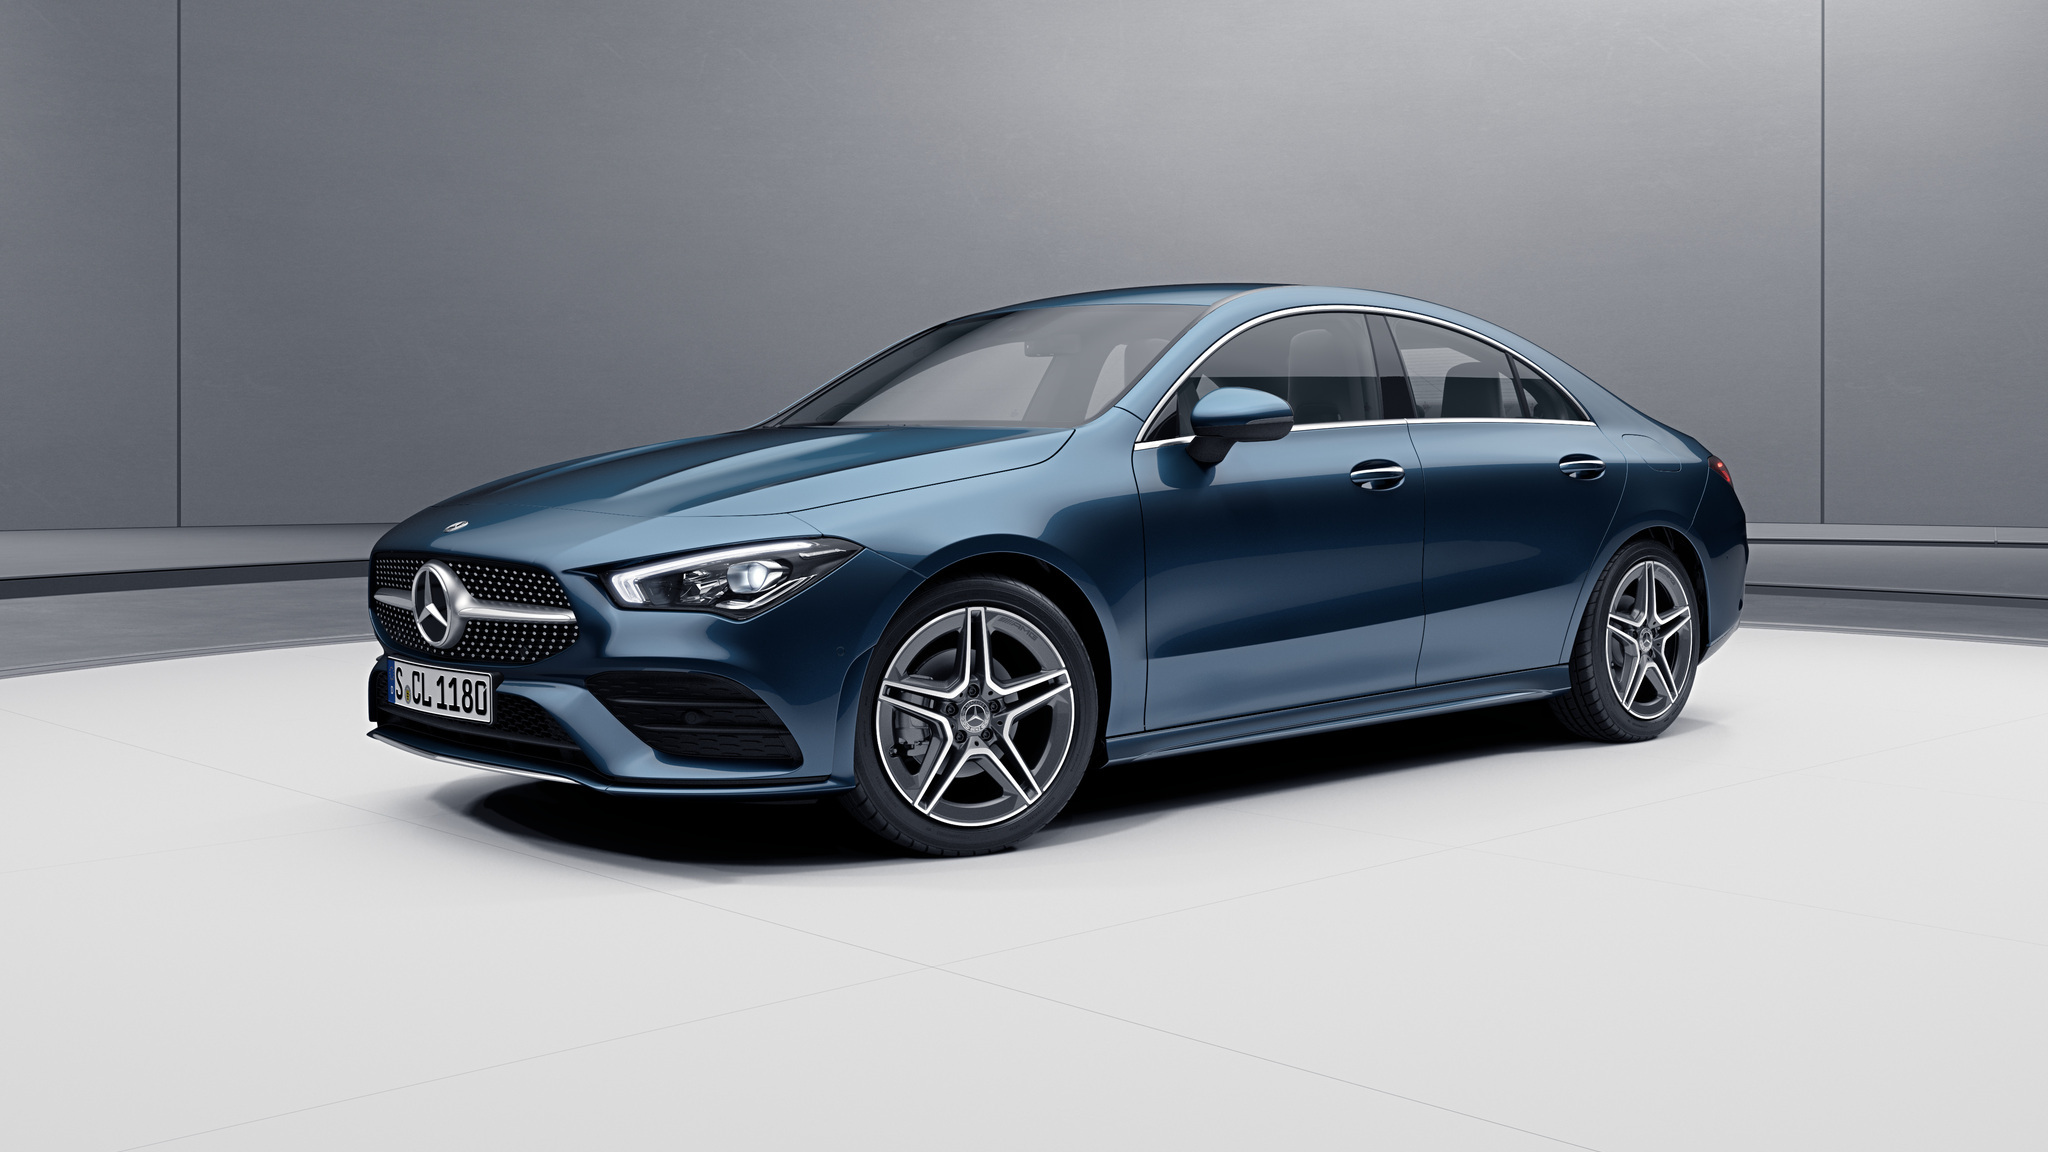 Vue de trois quarts de profil de la Mercedes CLA avec la peinture métallisé - bleu denim